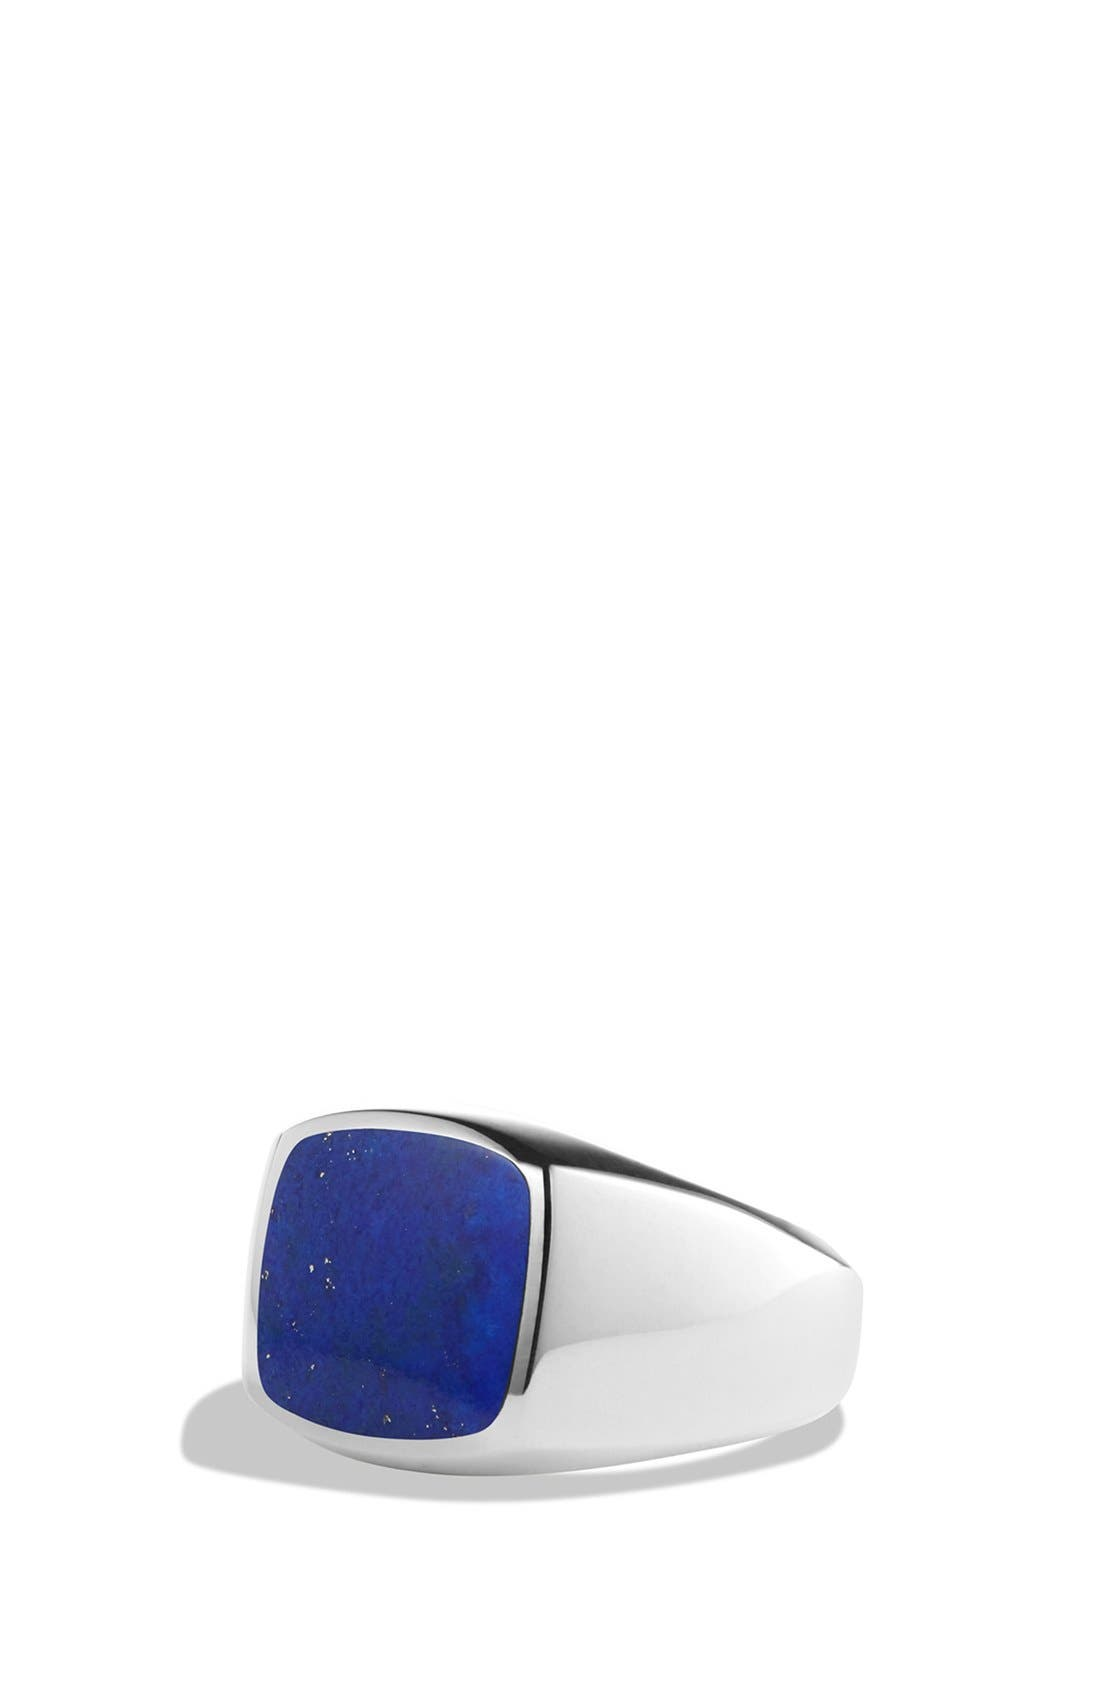 Main Image - David Yurman 'Exotic Stone' Signet Ring in Silver